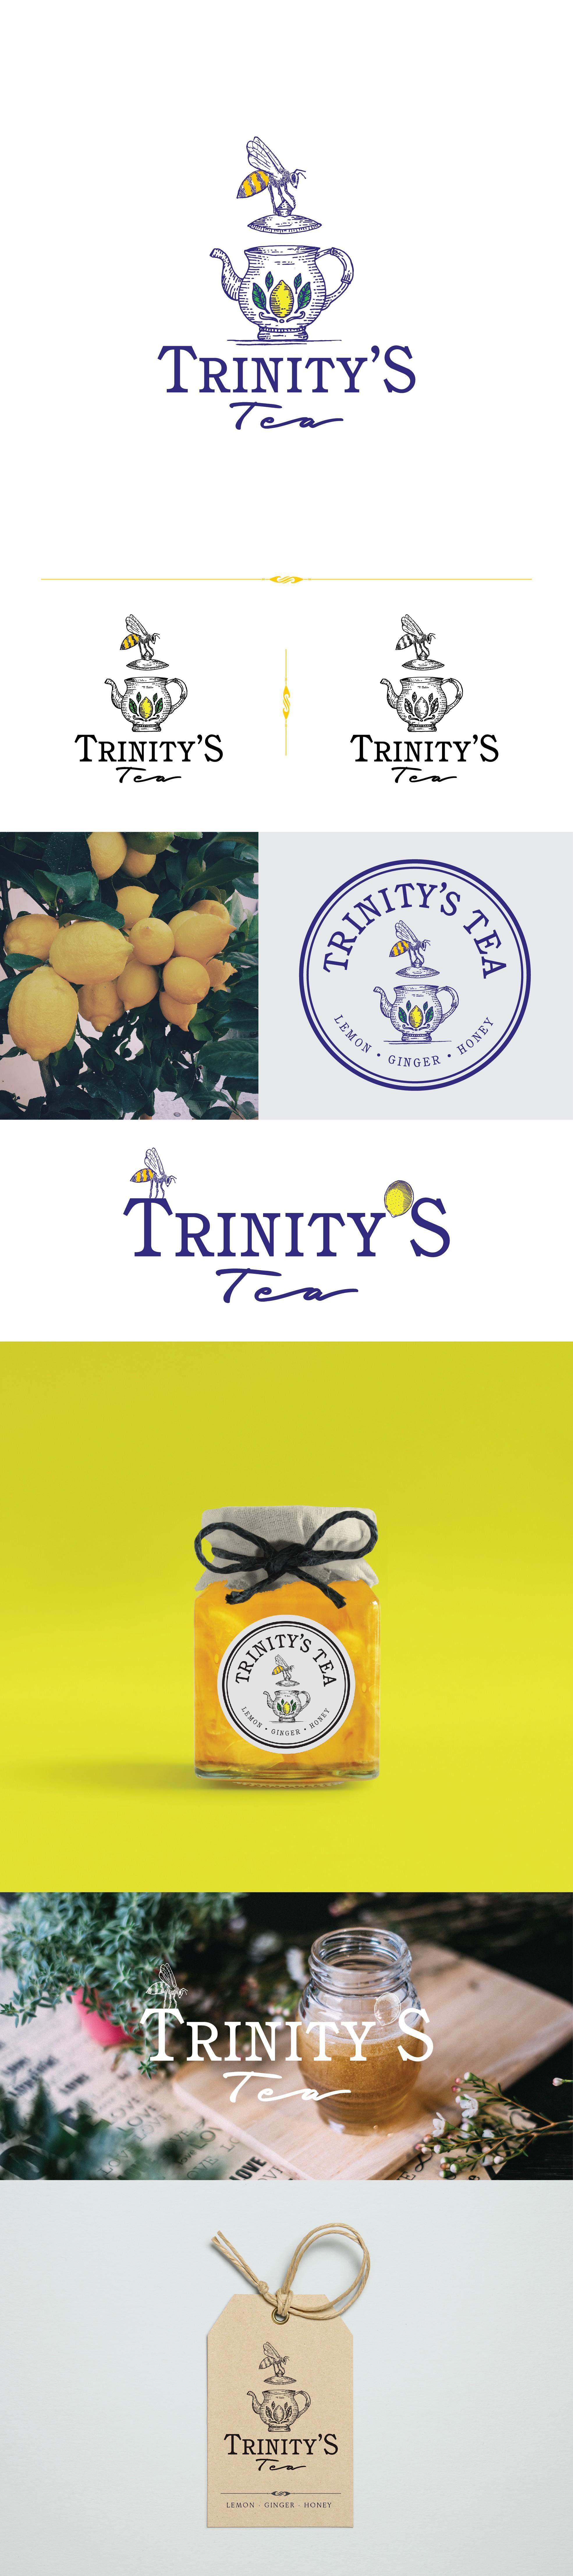 Lemon, Ginger & Honey tea needs a beautiful logo.